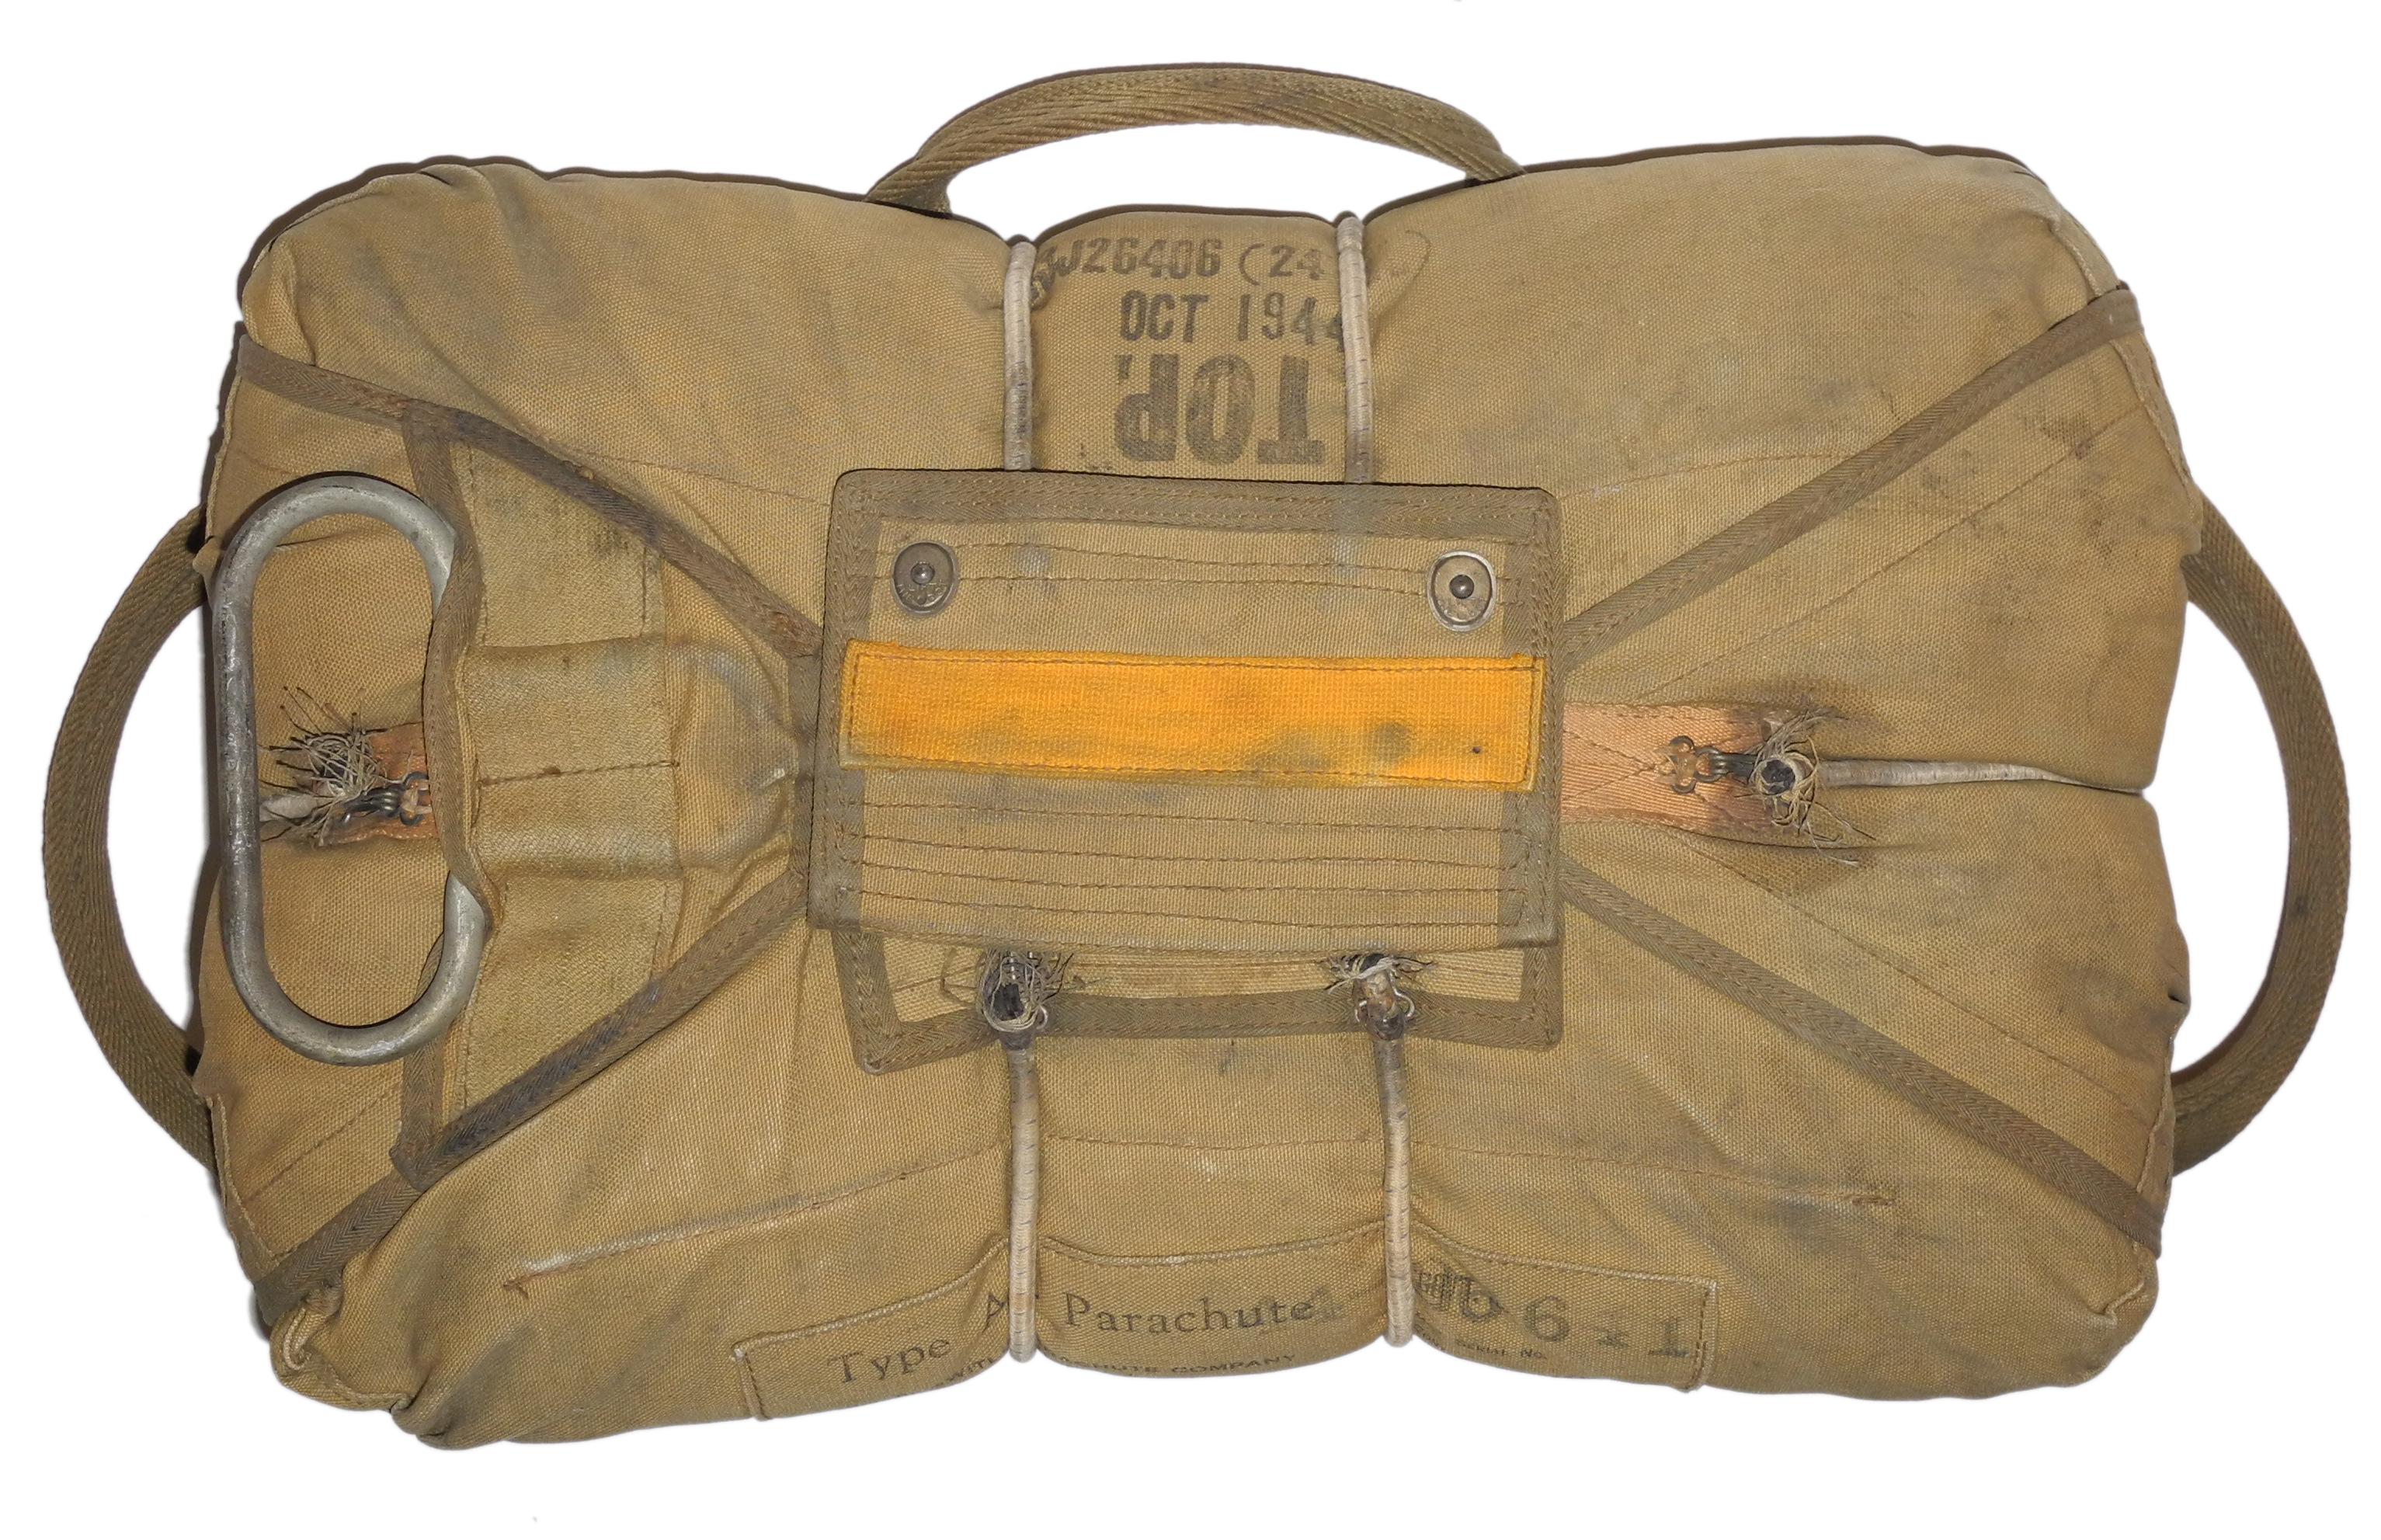 AAF A-4 chest parachute